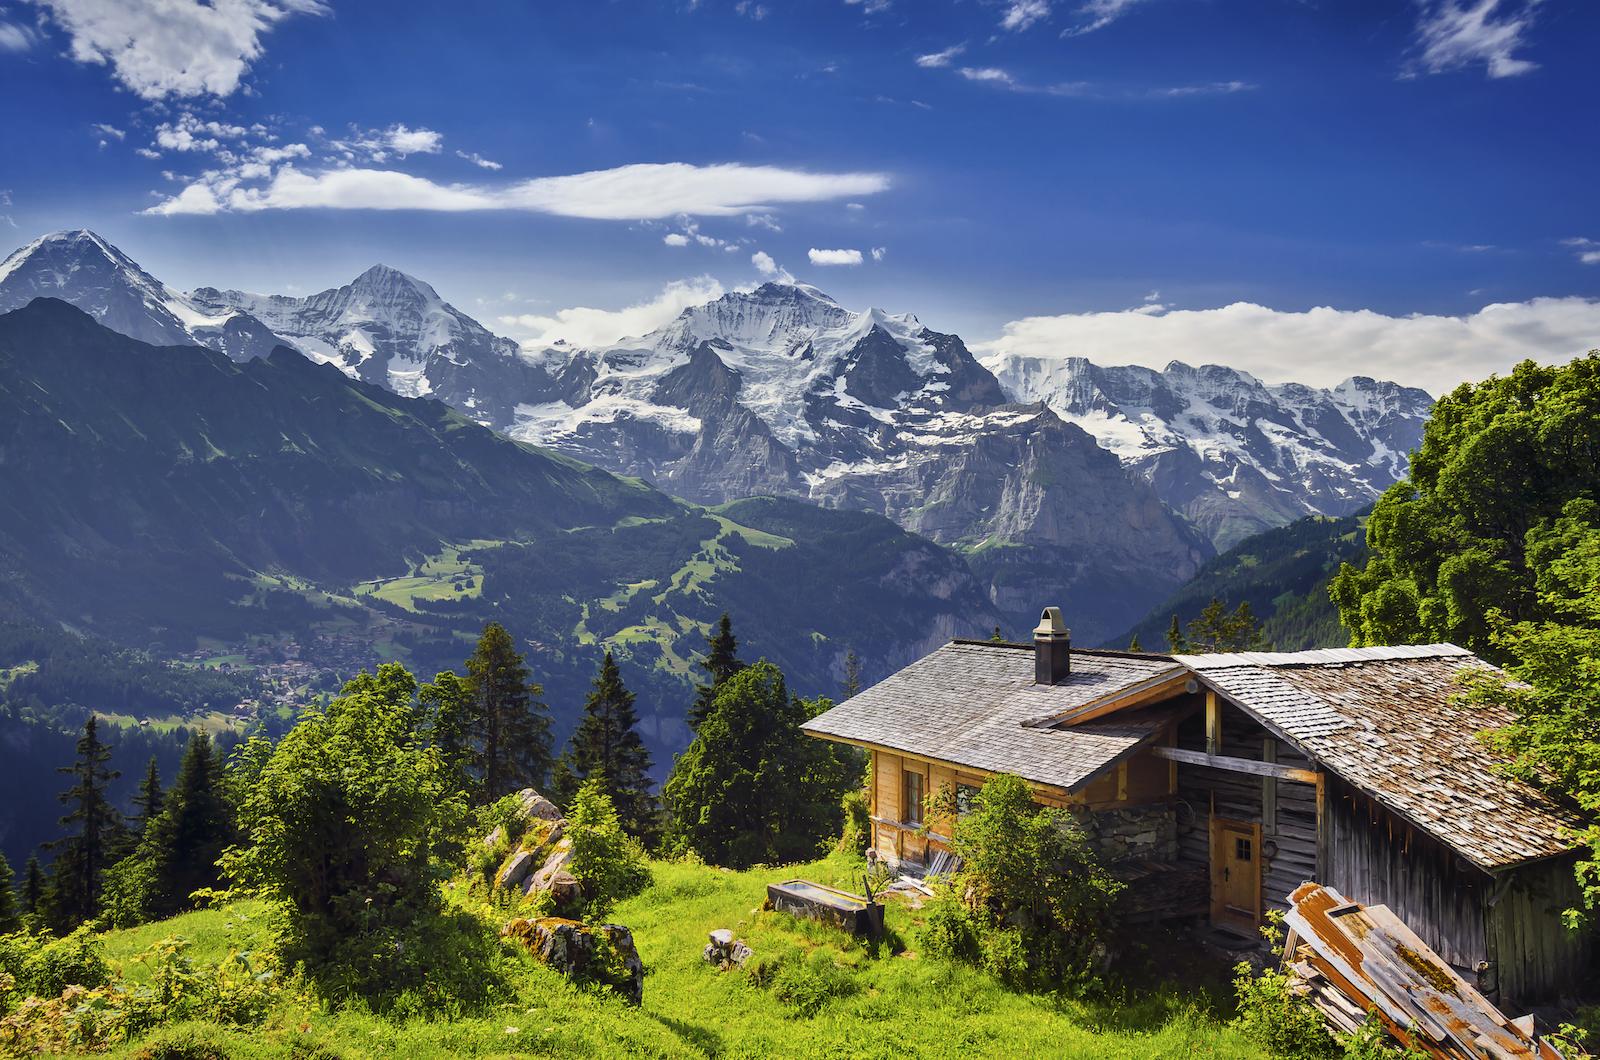 bigstock-The-Swiss-Alps-49255280-copie